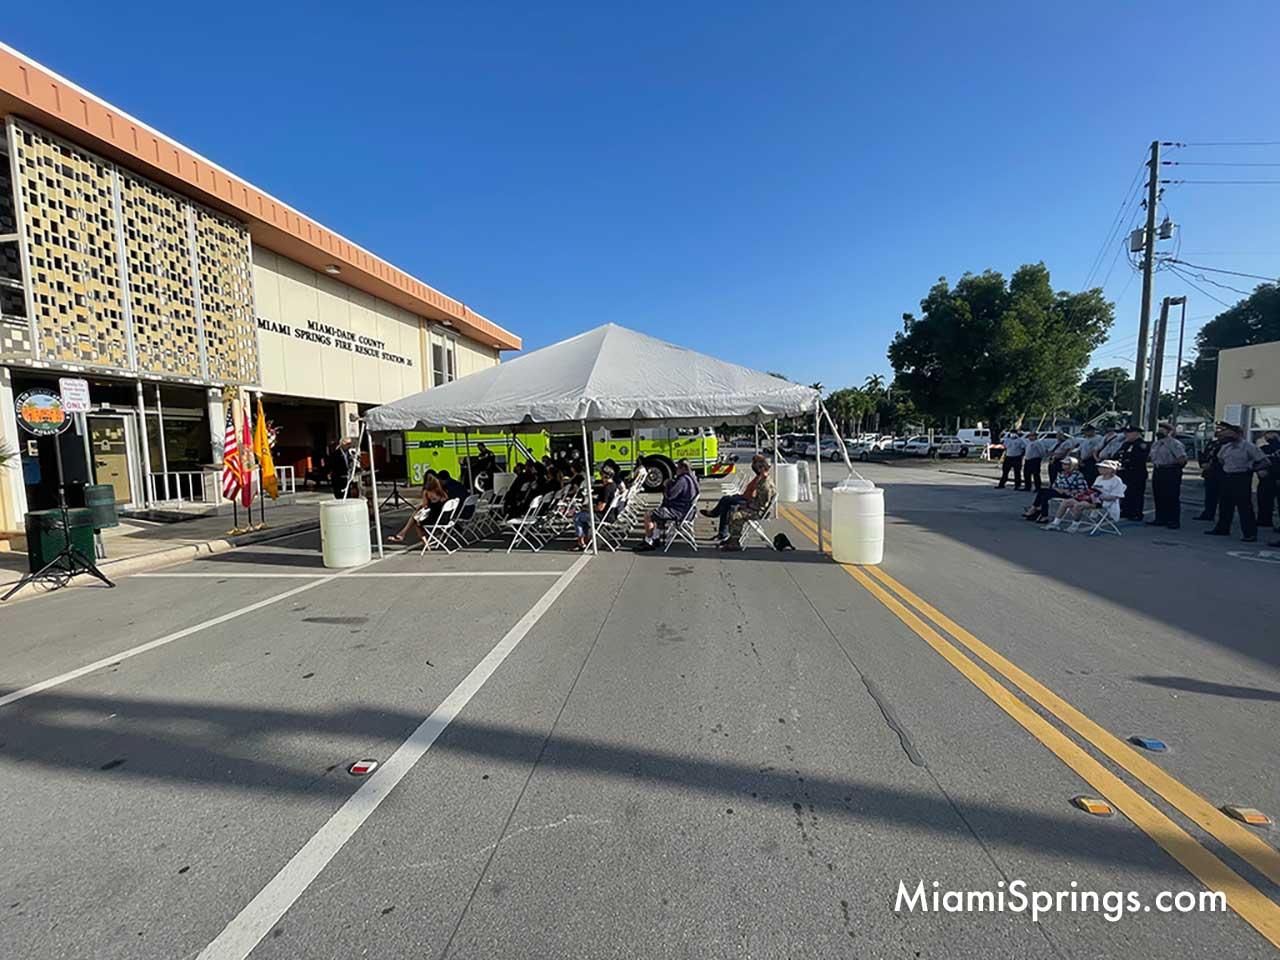 Miami Springs September 11 Ceremony